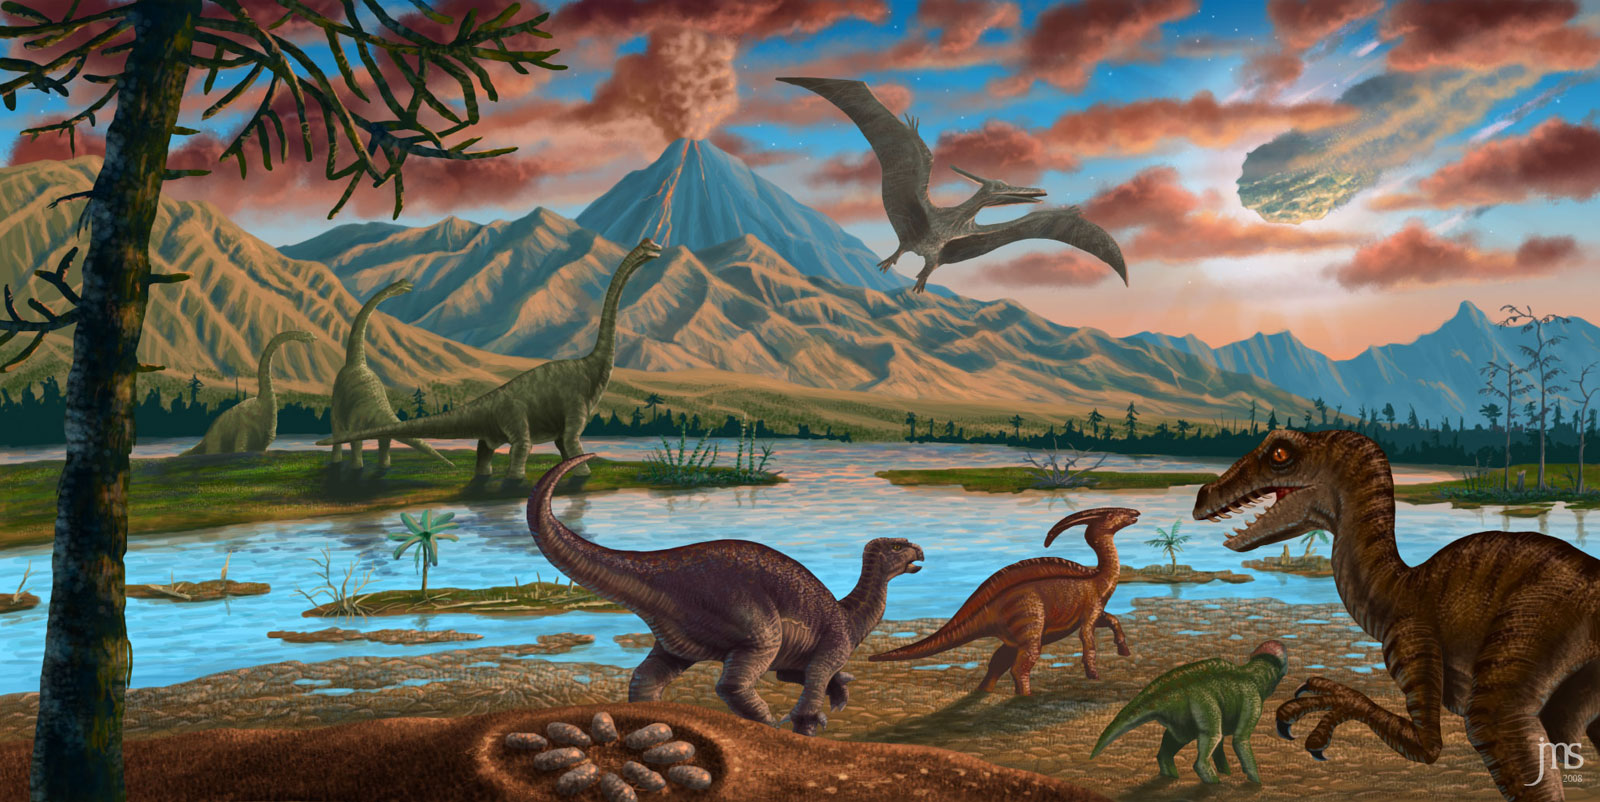 Projets Dinosaures Fiches De Préparations Cycle1 Cycle 2 Ulis